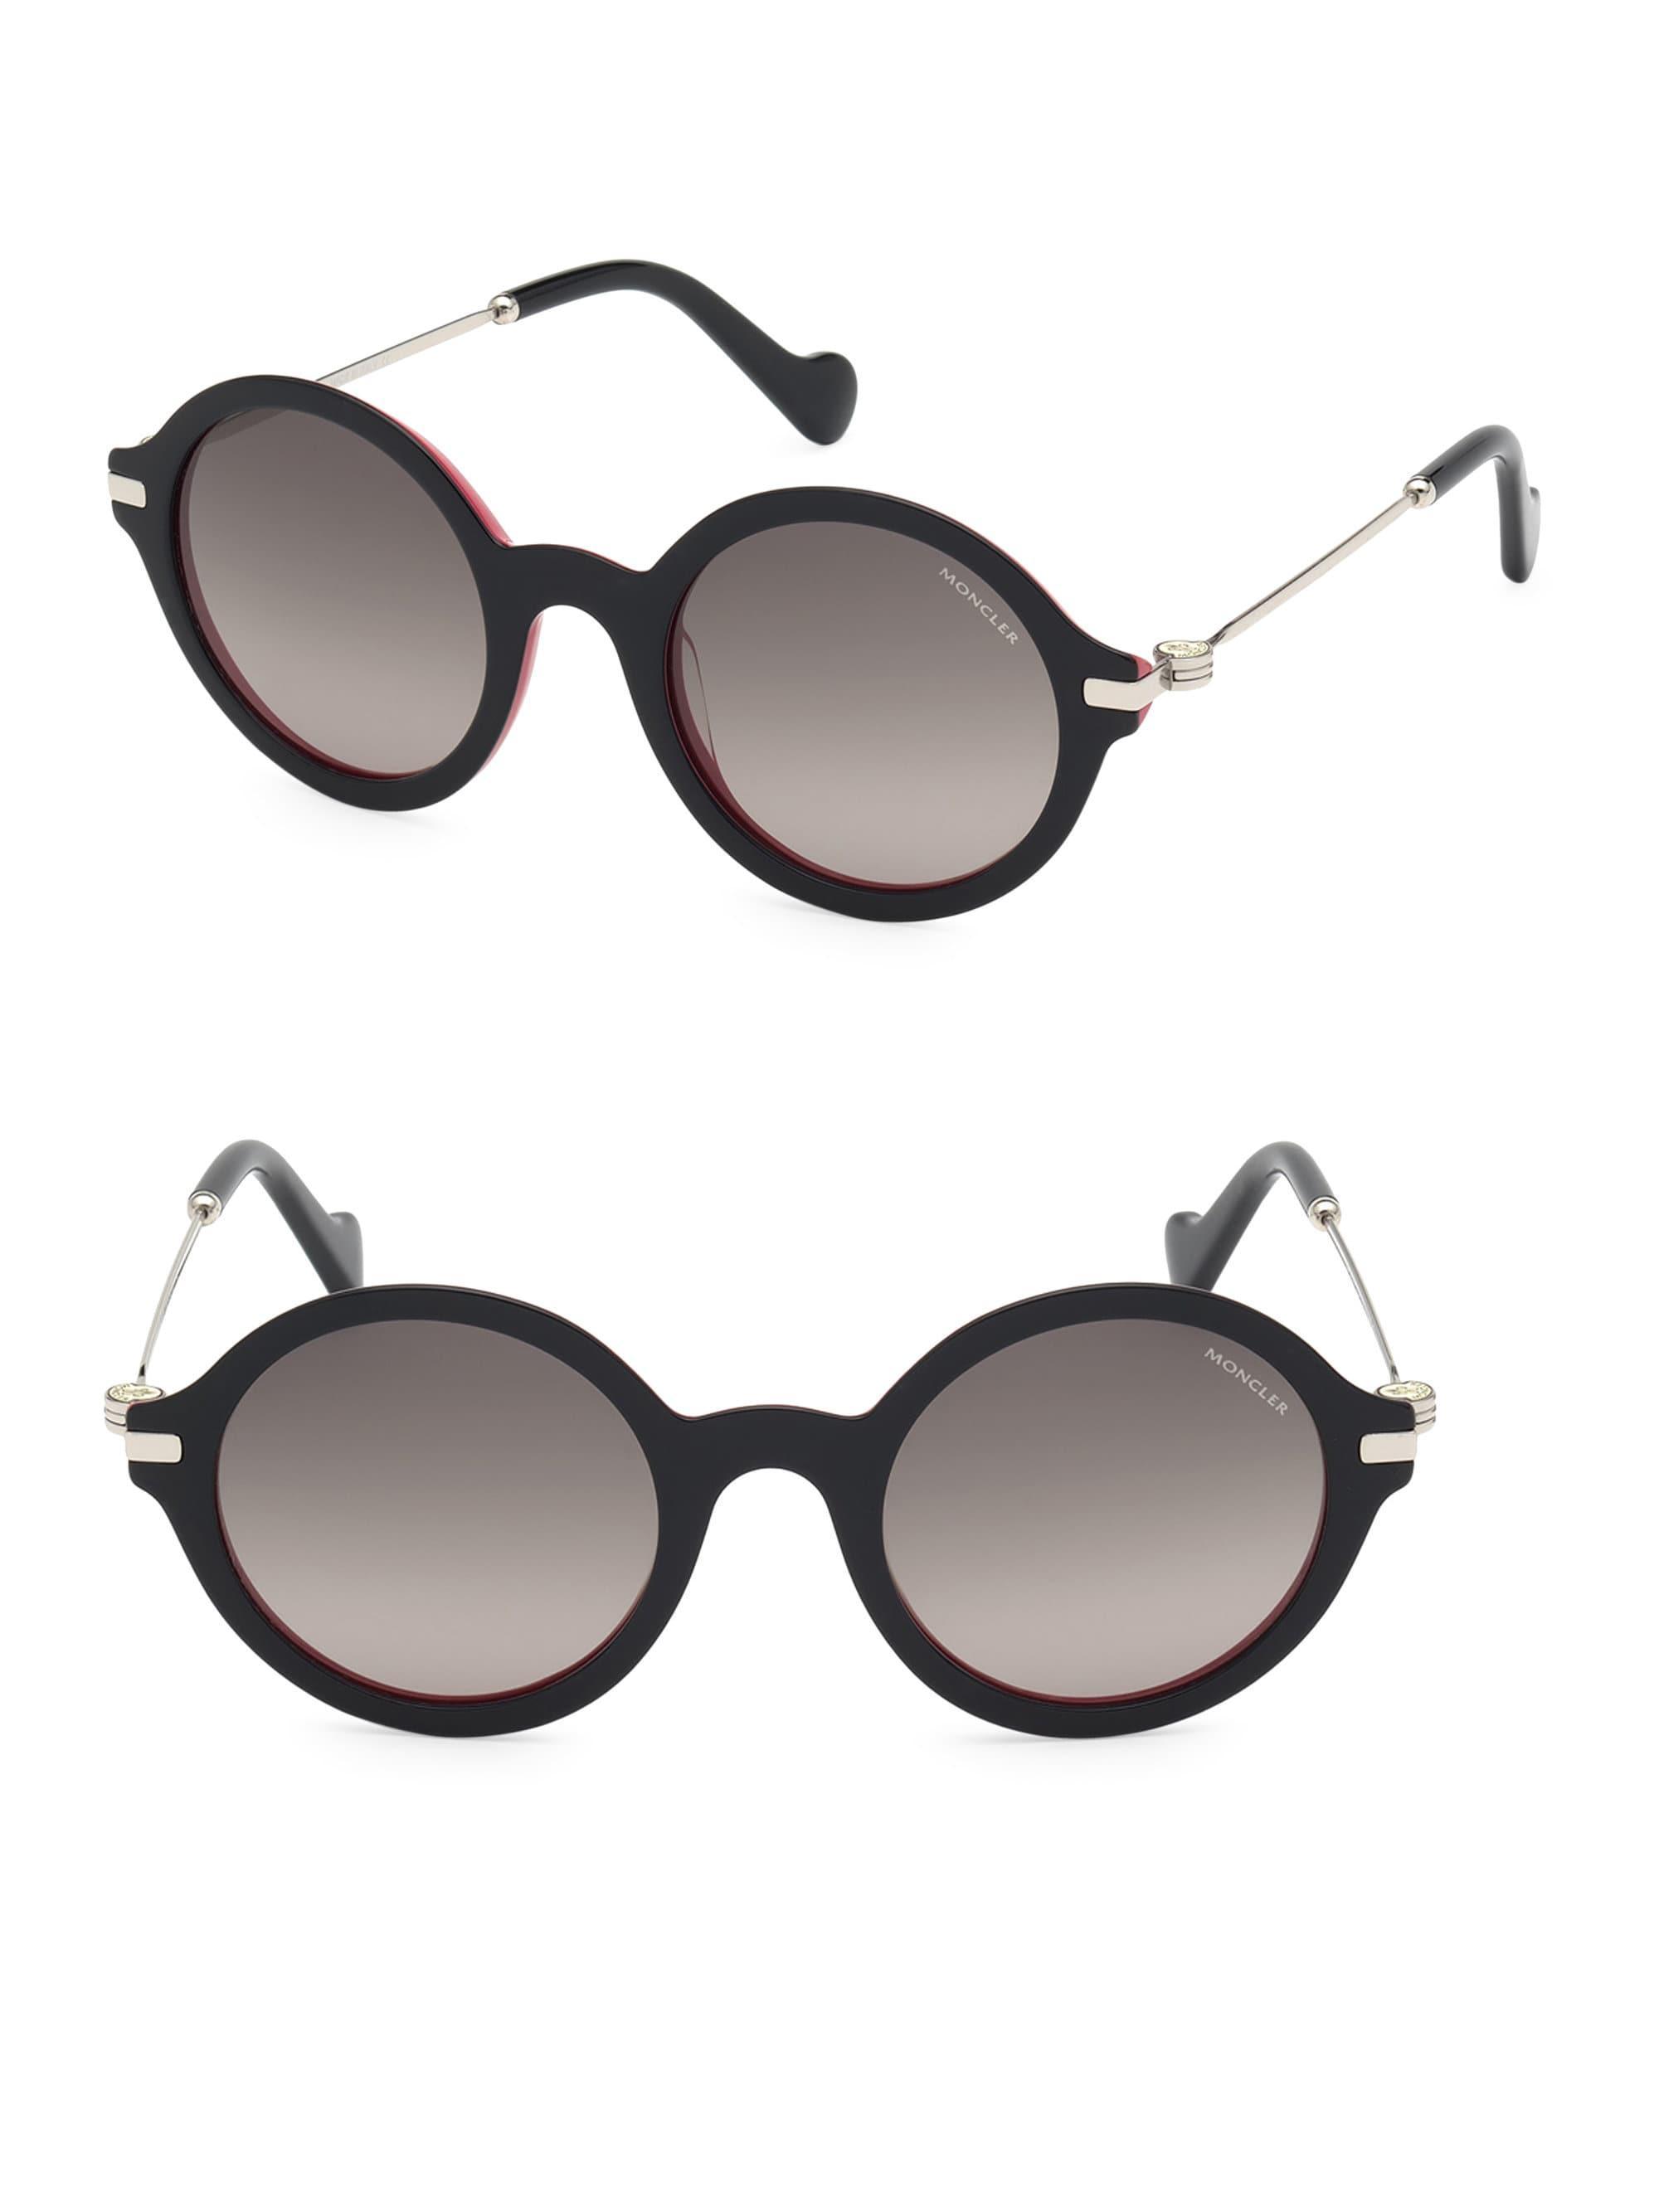 931a9785fdcf Moncler - Black 50mm Round Sunglasses - Lyst. View fullscreen